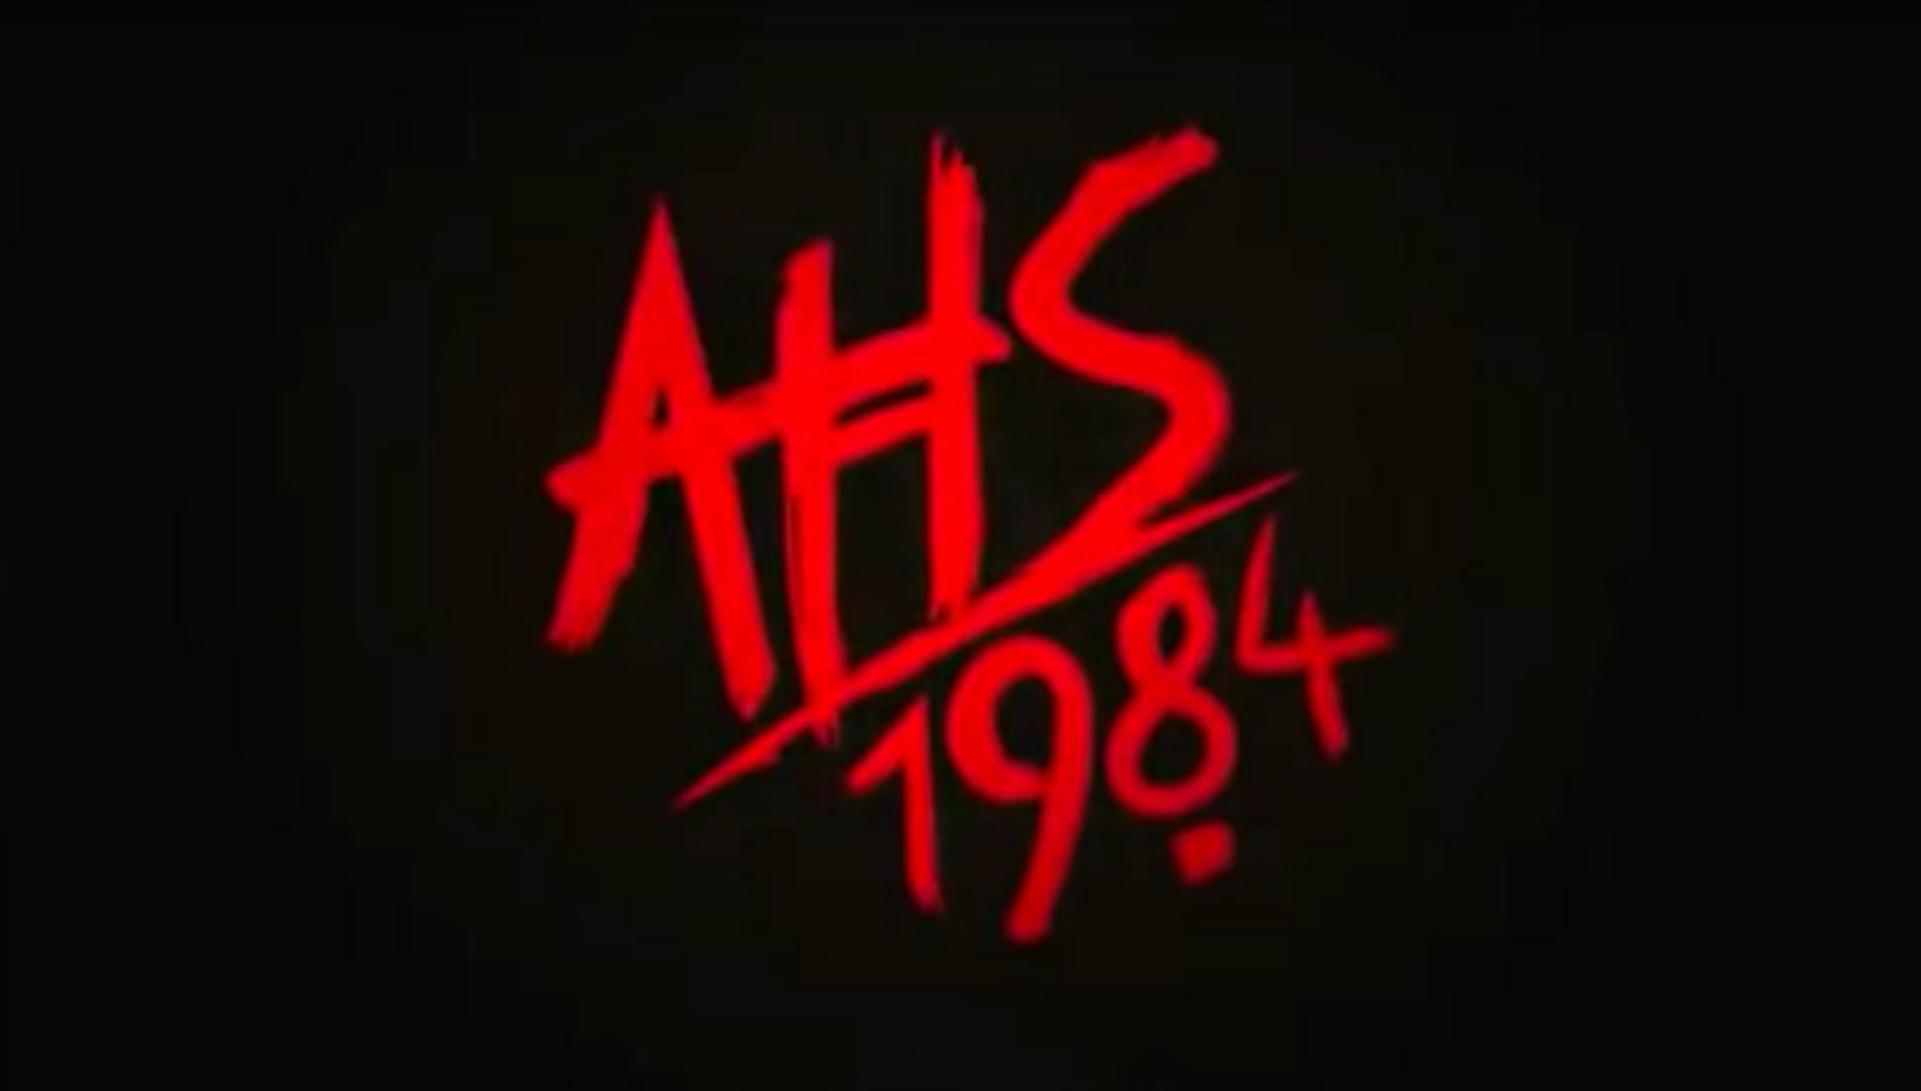 American Horror Story: 1984 Trailer - That Shelf